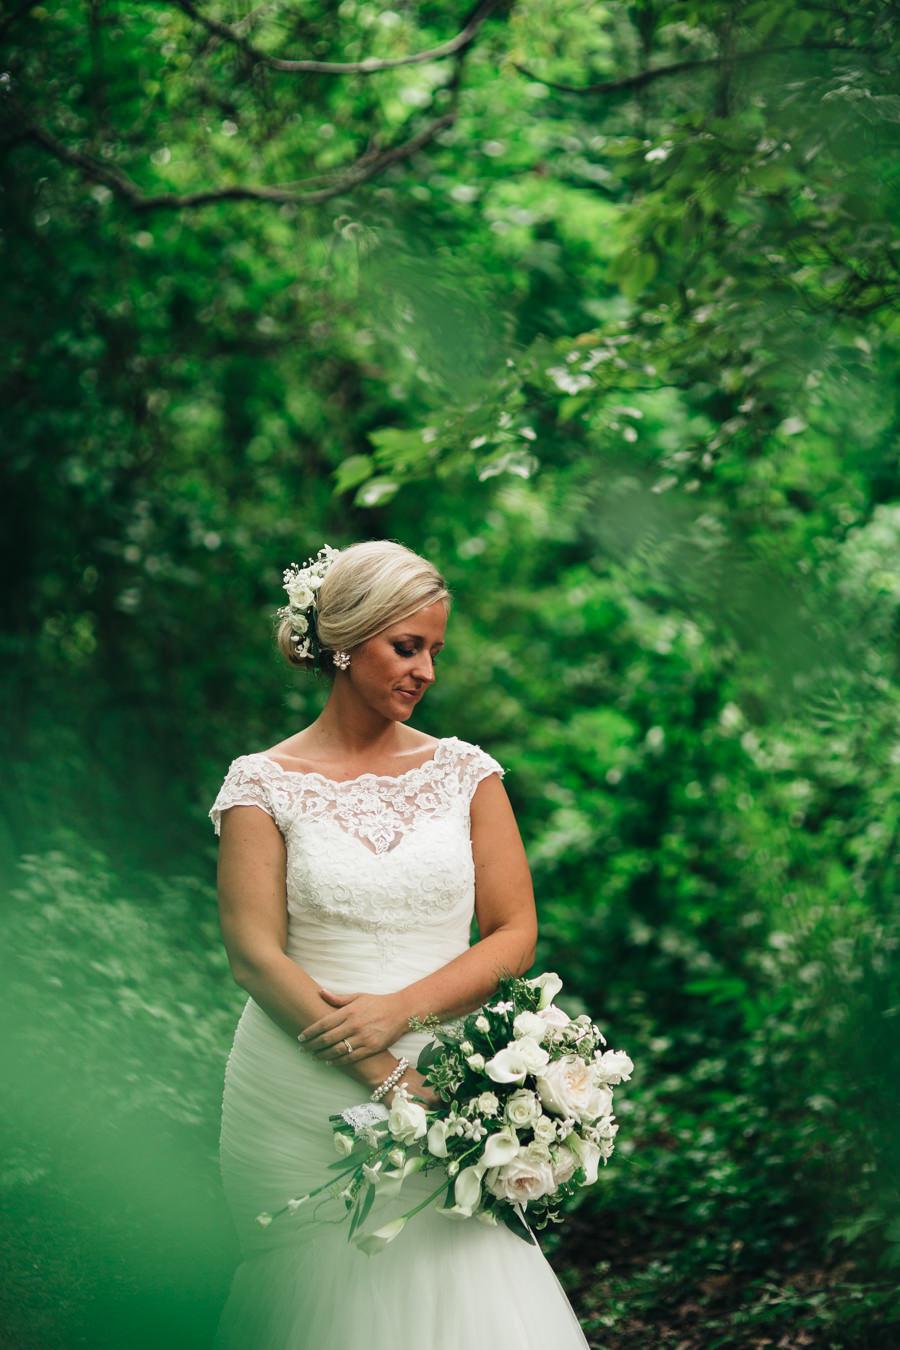 Bridal portrait at Wildwood Metropark in Toledo, Ohio